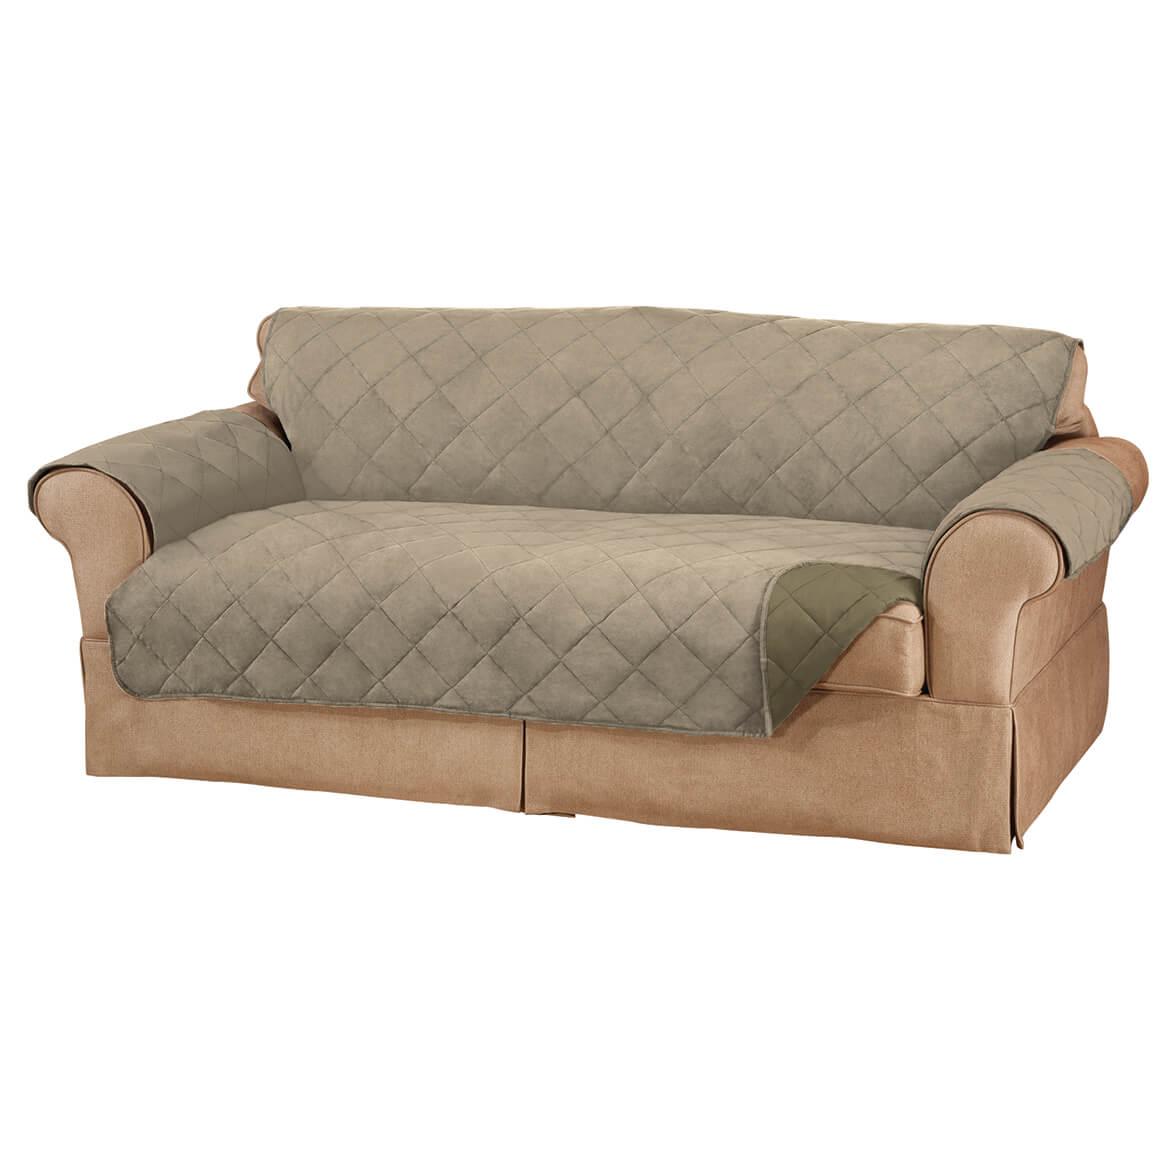 Naomi Suede-Microfiber XL Sofa Cover By OakRidgeTM